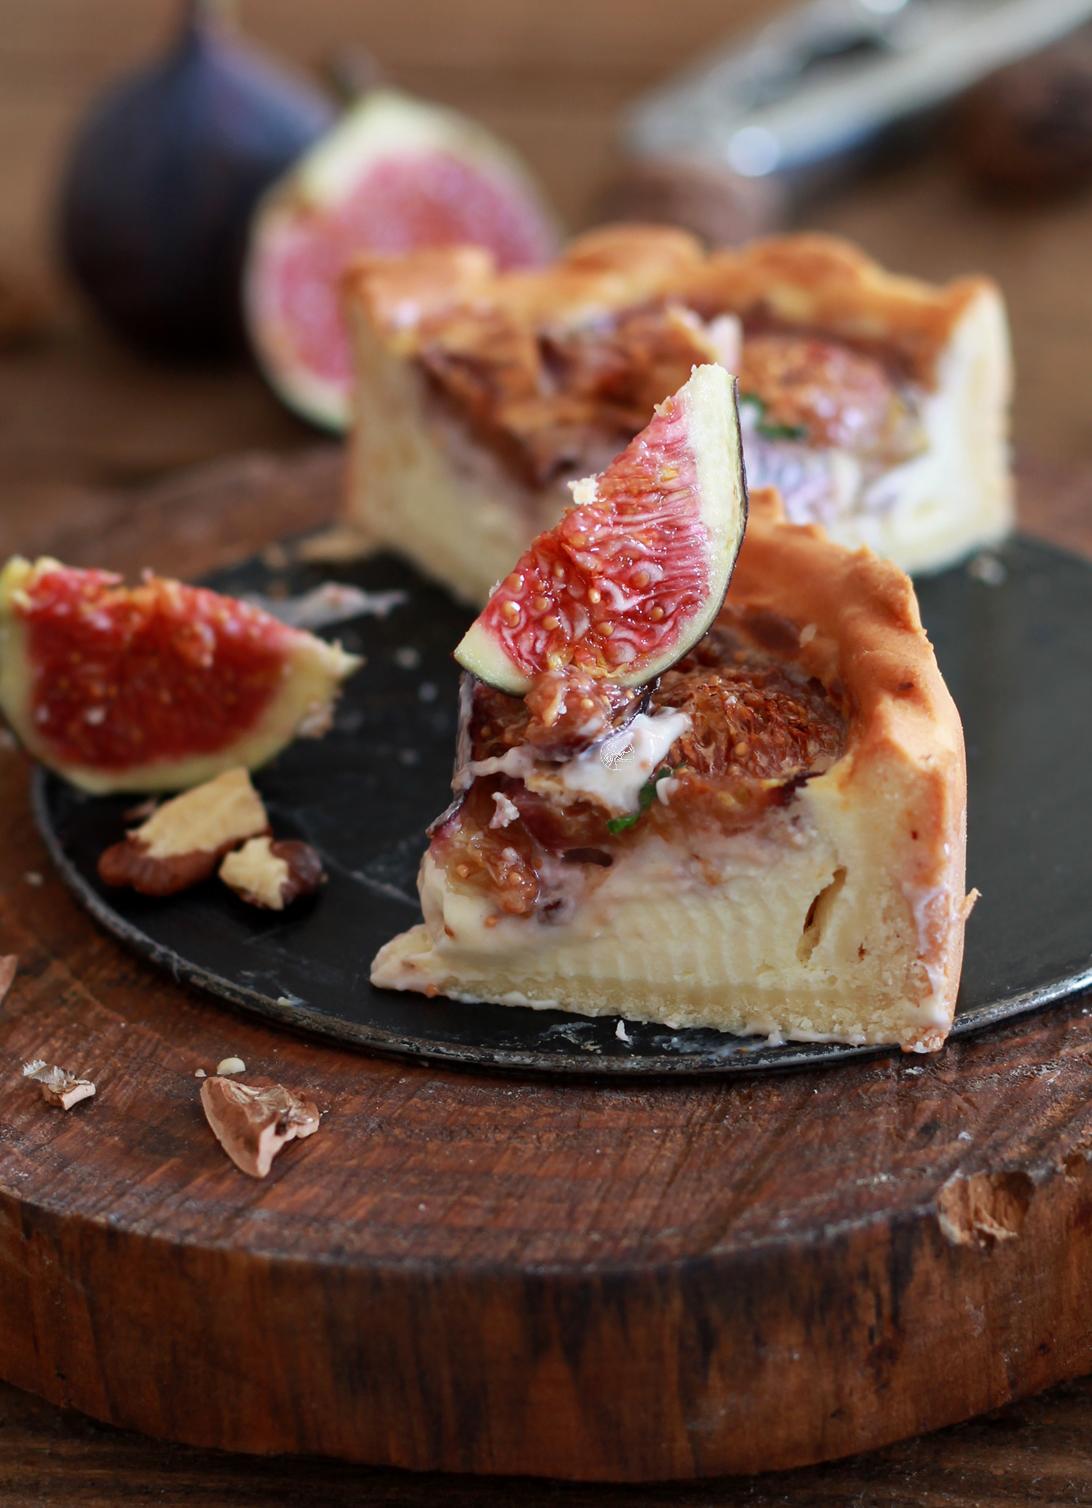 https://blog.giallozafferano.it/tastydiana/crostata-salata-senza-glutine-vegana/